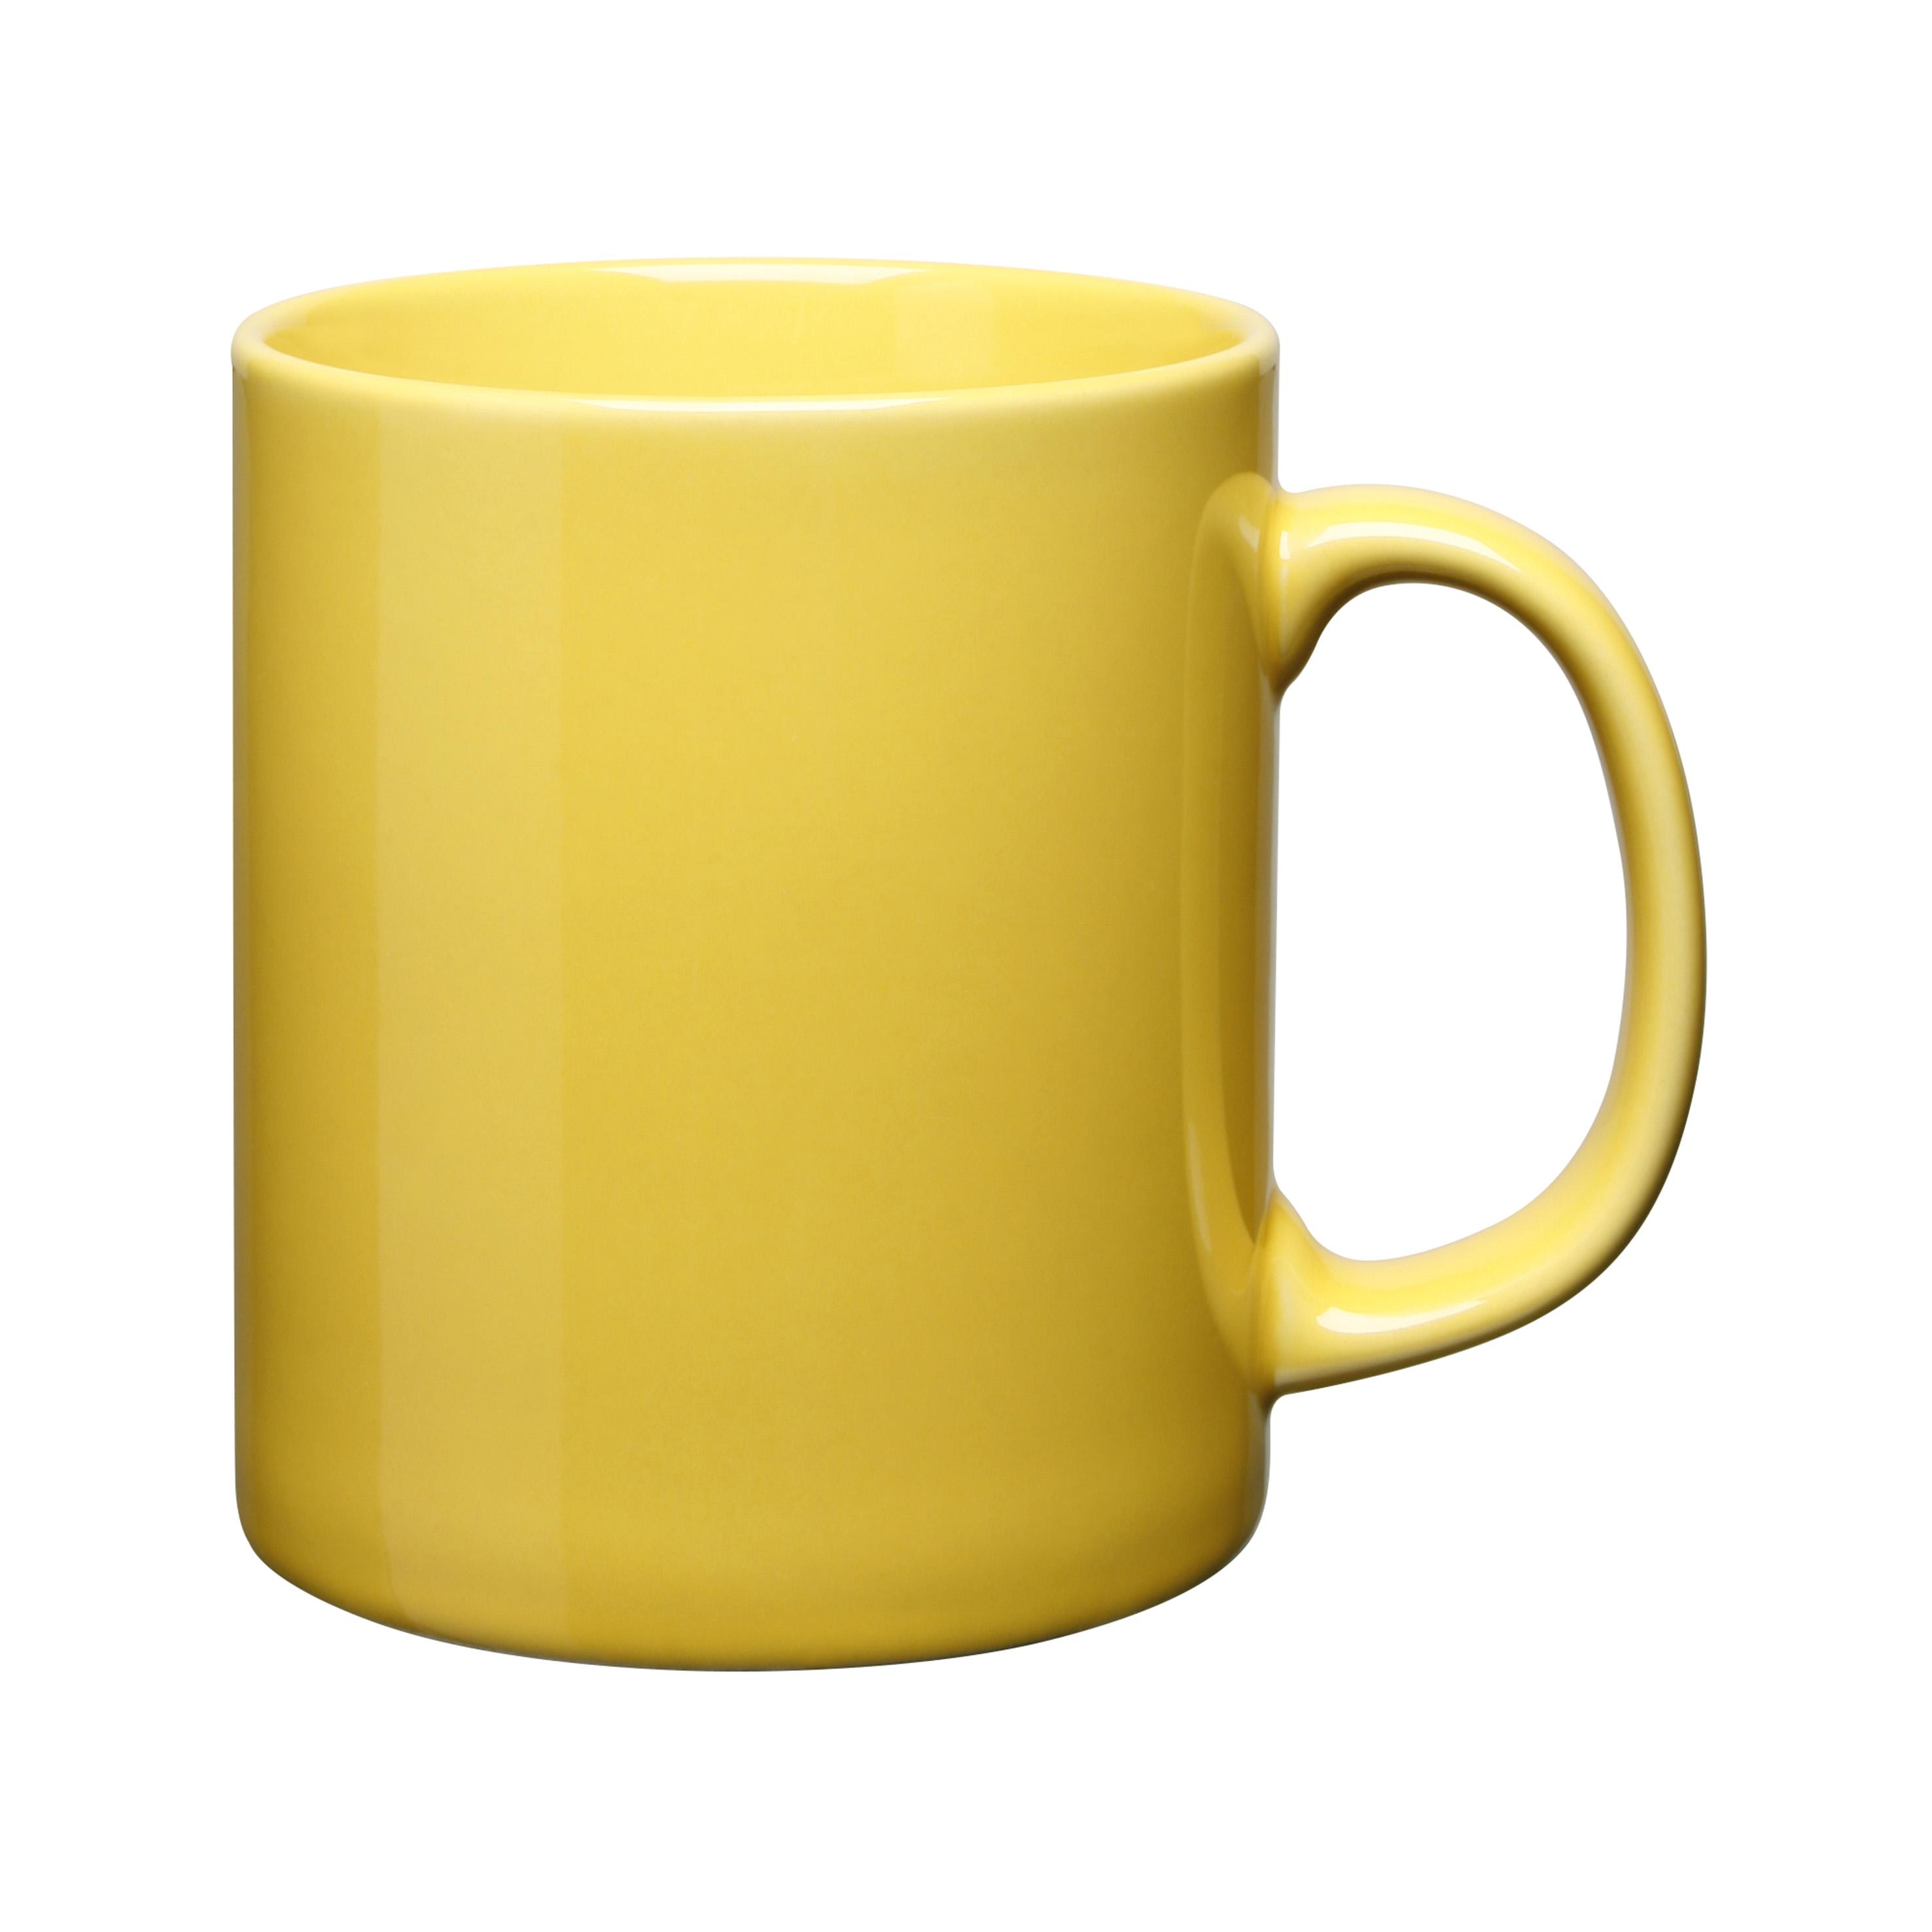 Personalised Durham/Cambridge Mug